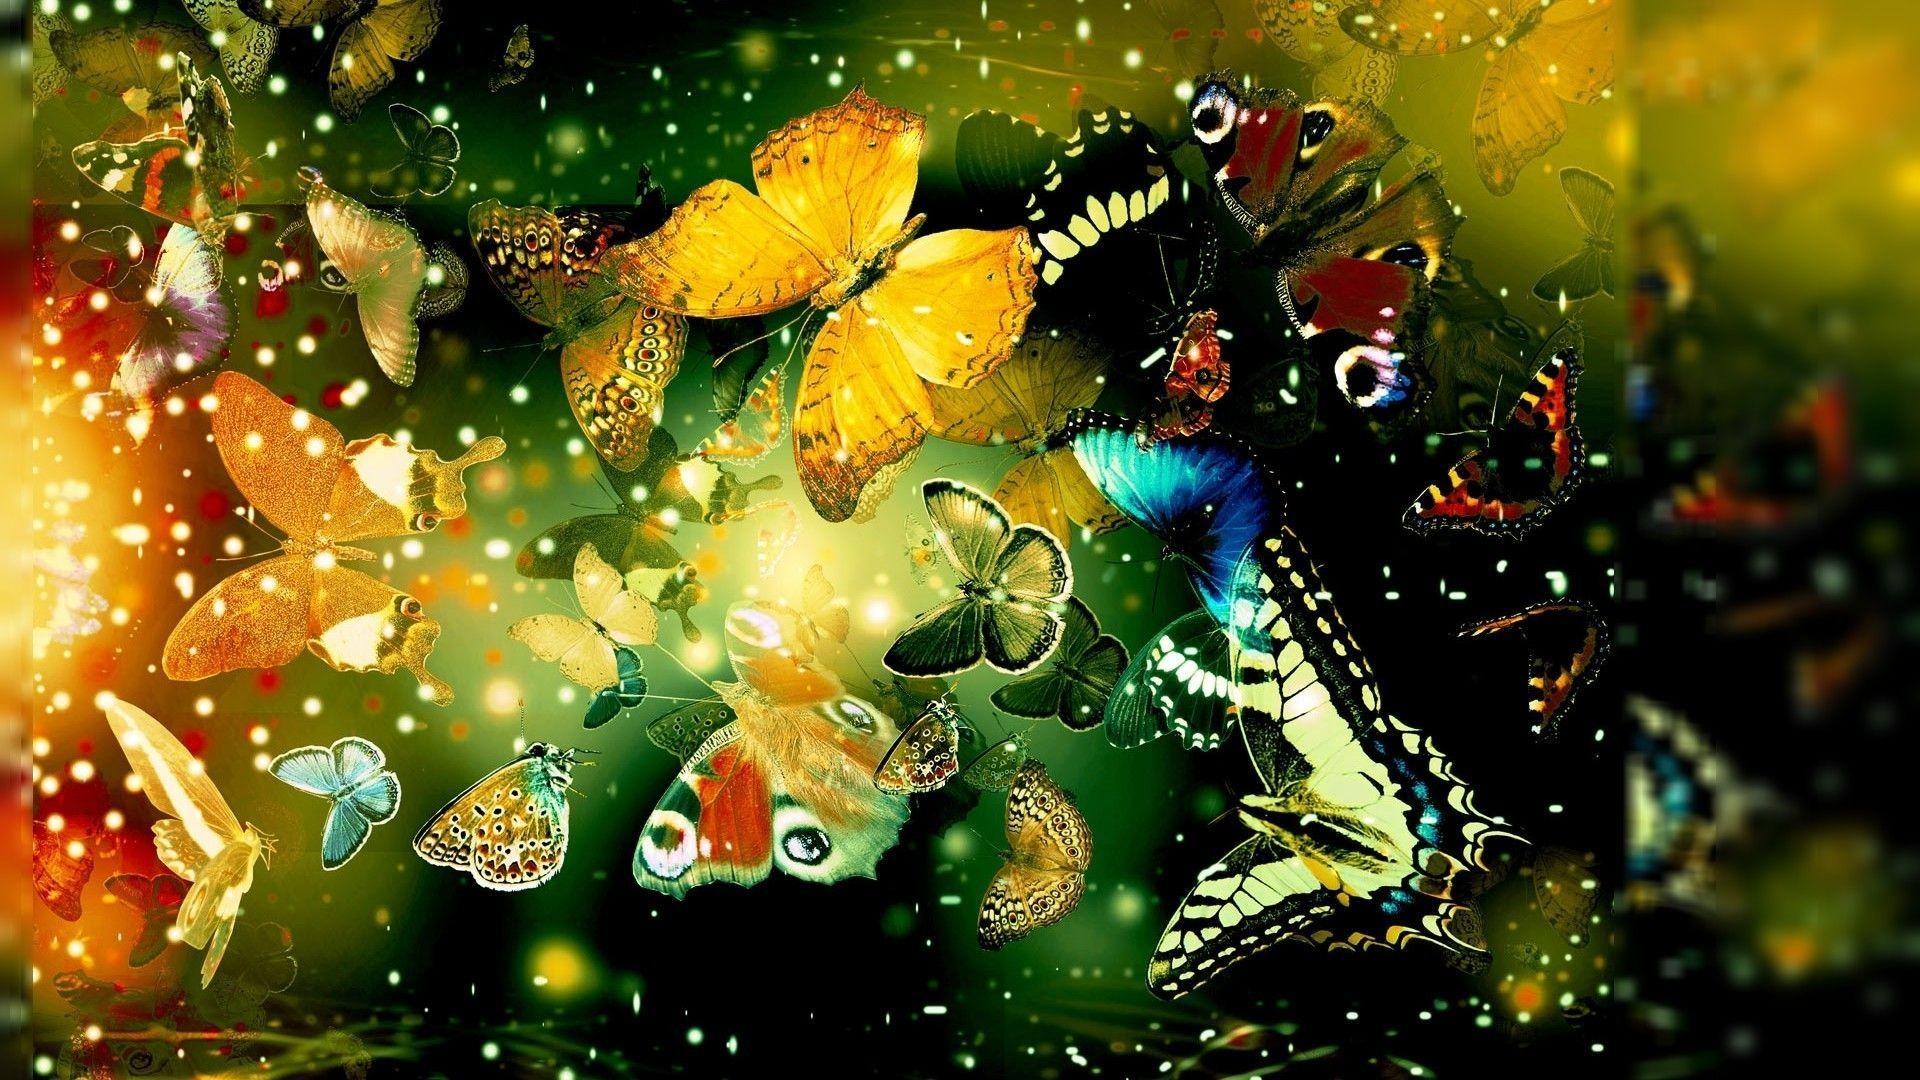 Nachural Wallpaper Full Hd Cool Nature Desktop Backgrounds 56 Images